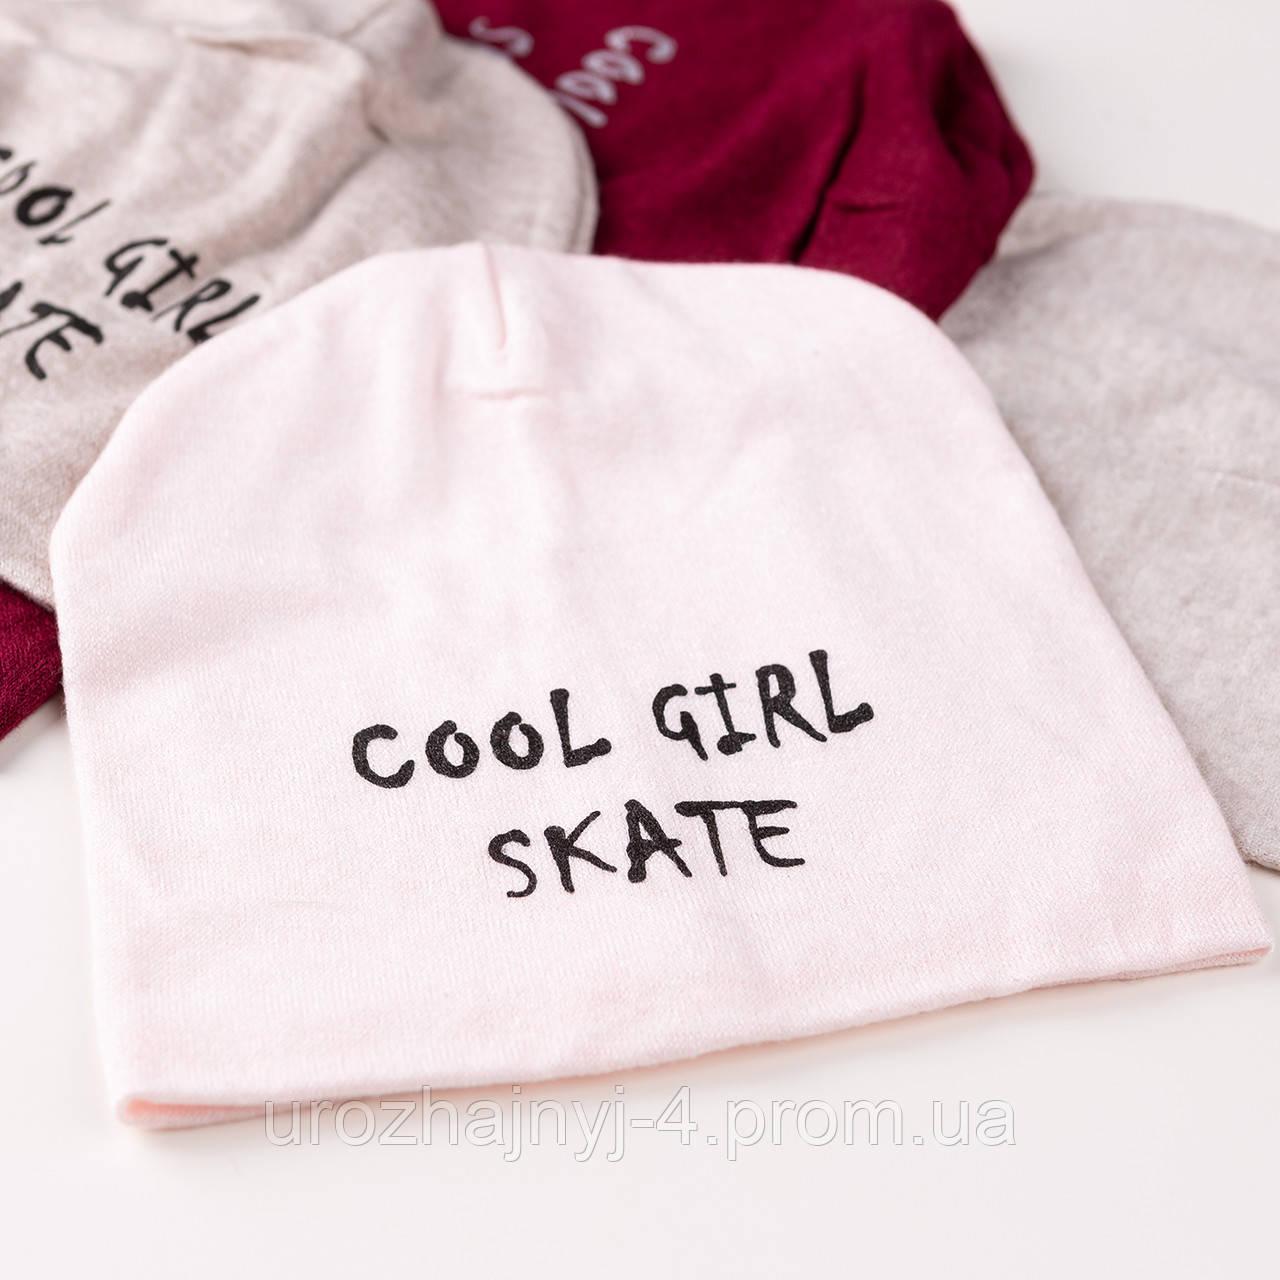 Трикотажная шапка подкладка х/б р50-52 5шт упаковка